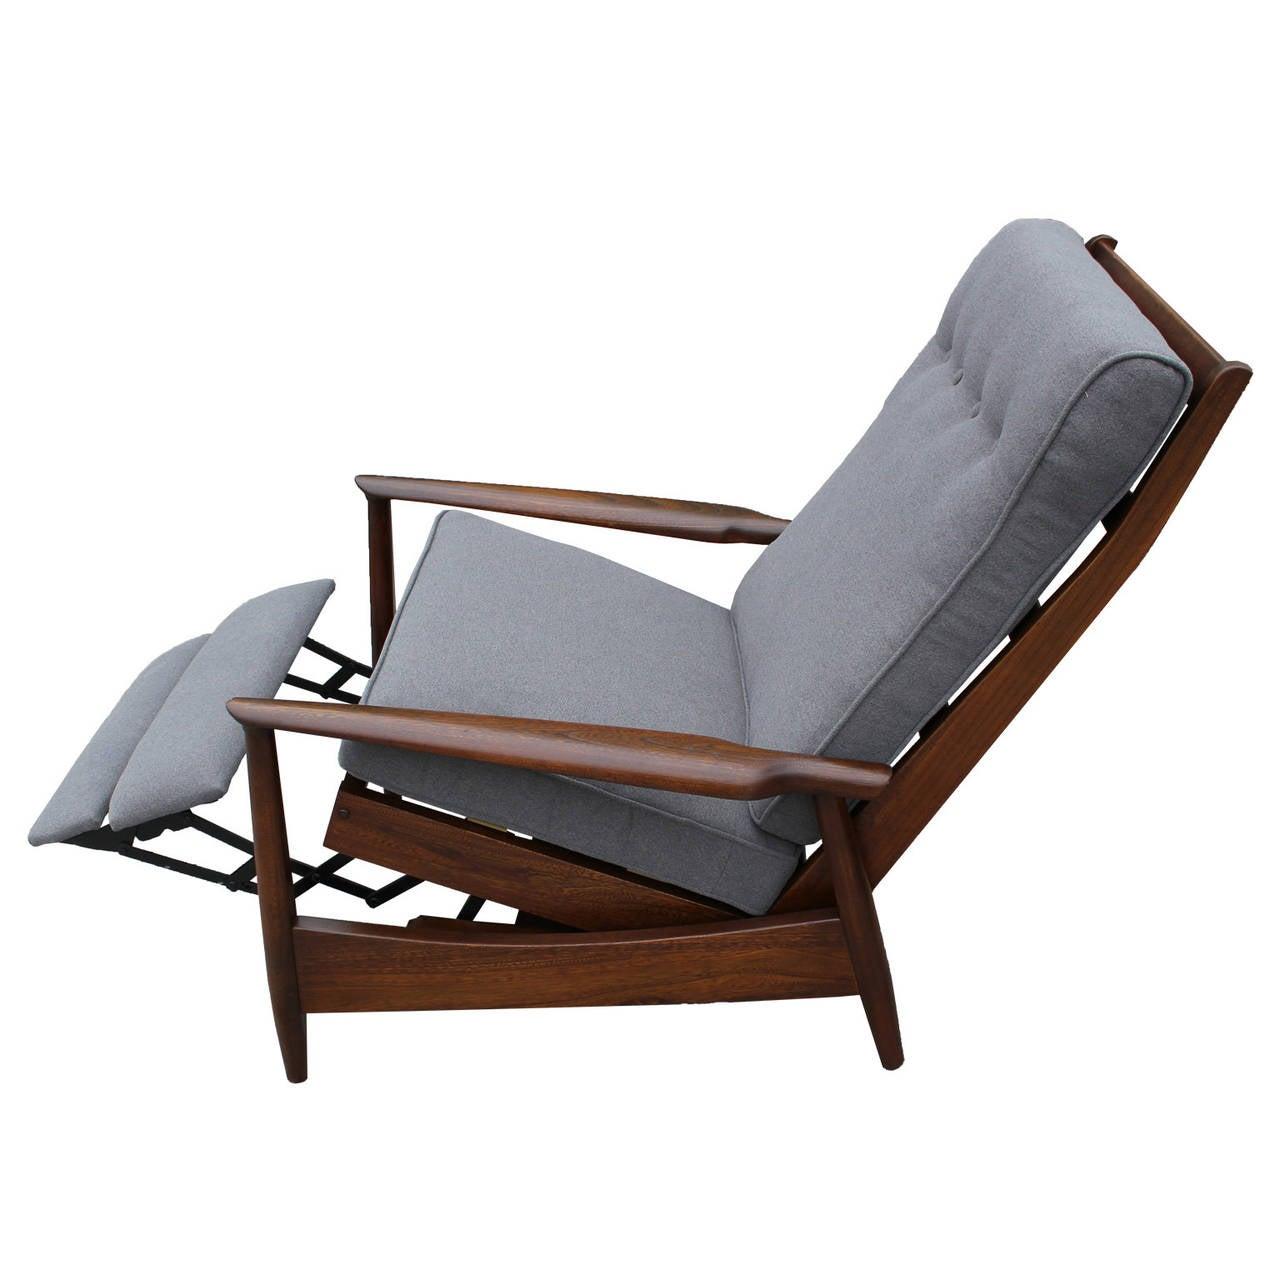 Scandinavian reclining lounge chair at 1stdibs for Chair recliner